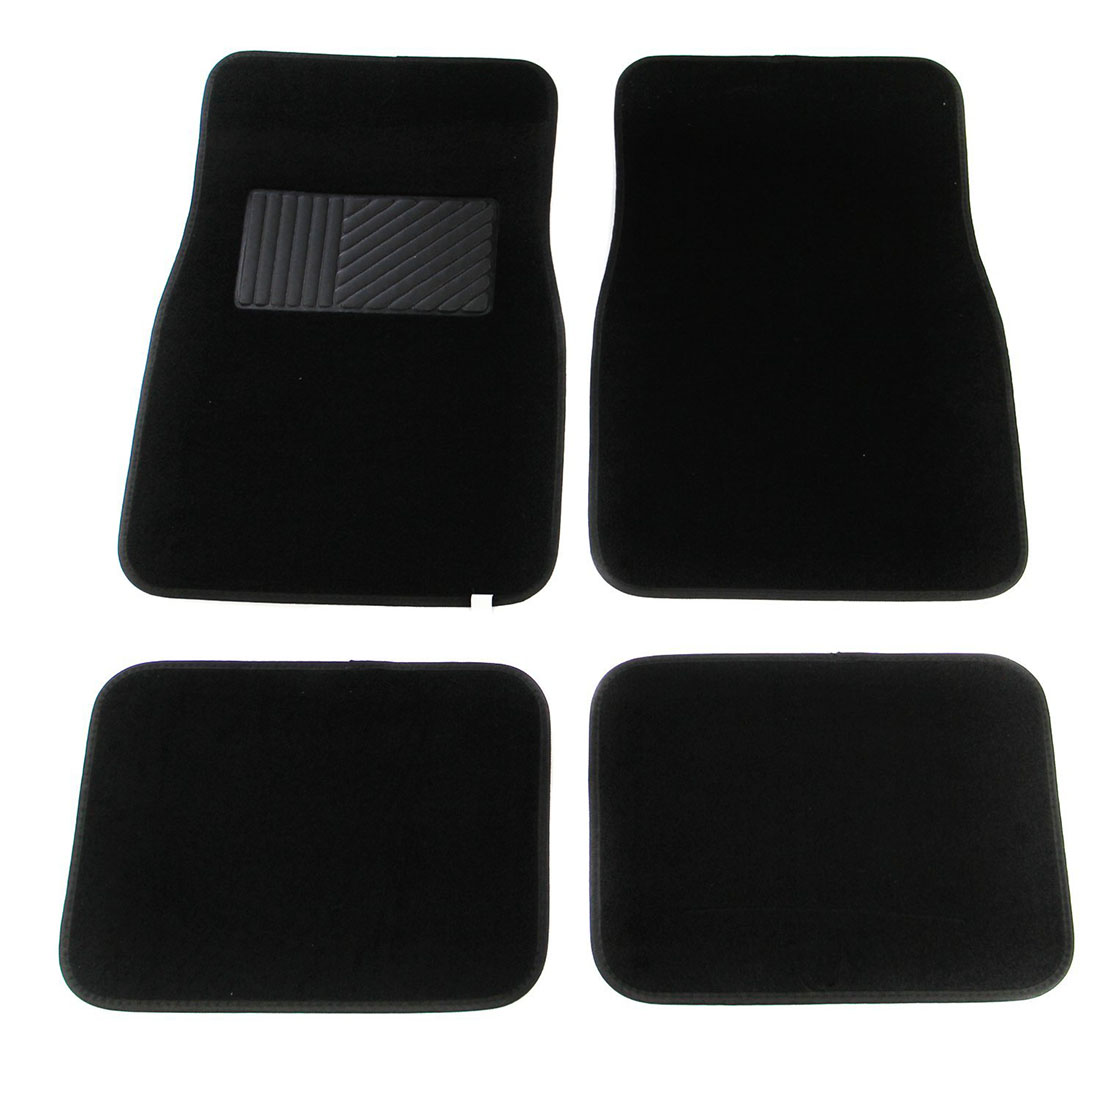 Multi Season Carpet Floor Mats 4pc Set Black Fit Most Cars